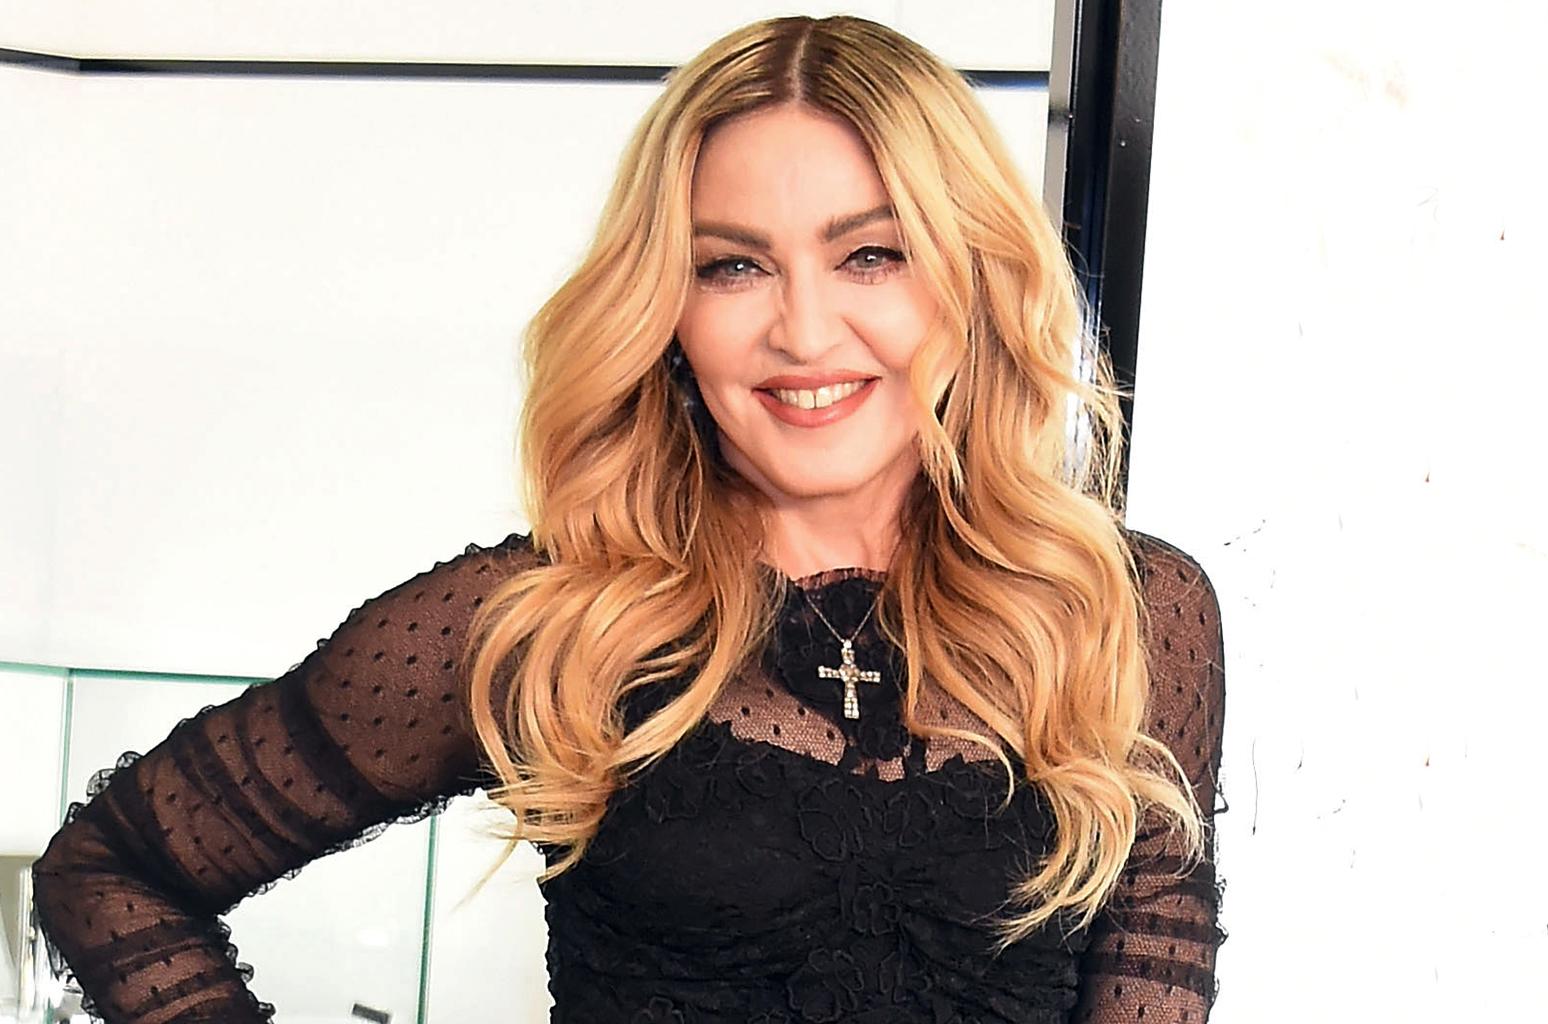 madonna feb 2016 billboard 1548.jpg - Madonna compartilha vídeo divertidíssimo de suas filhas cantando funk